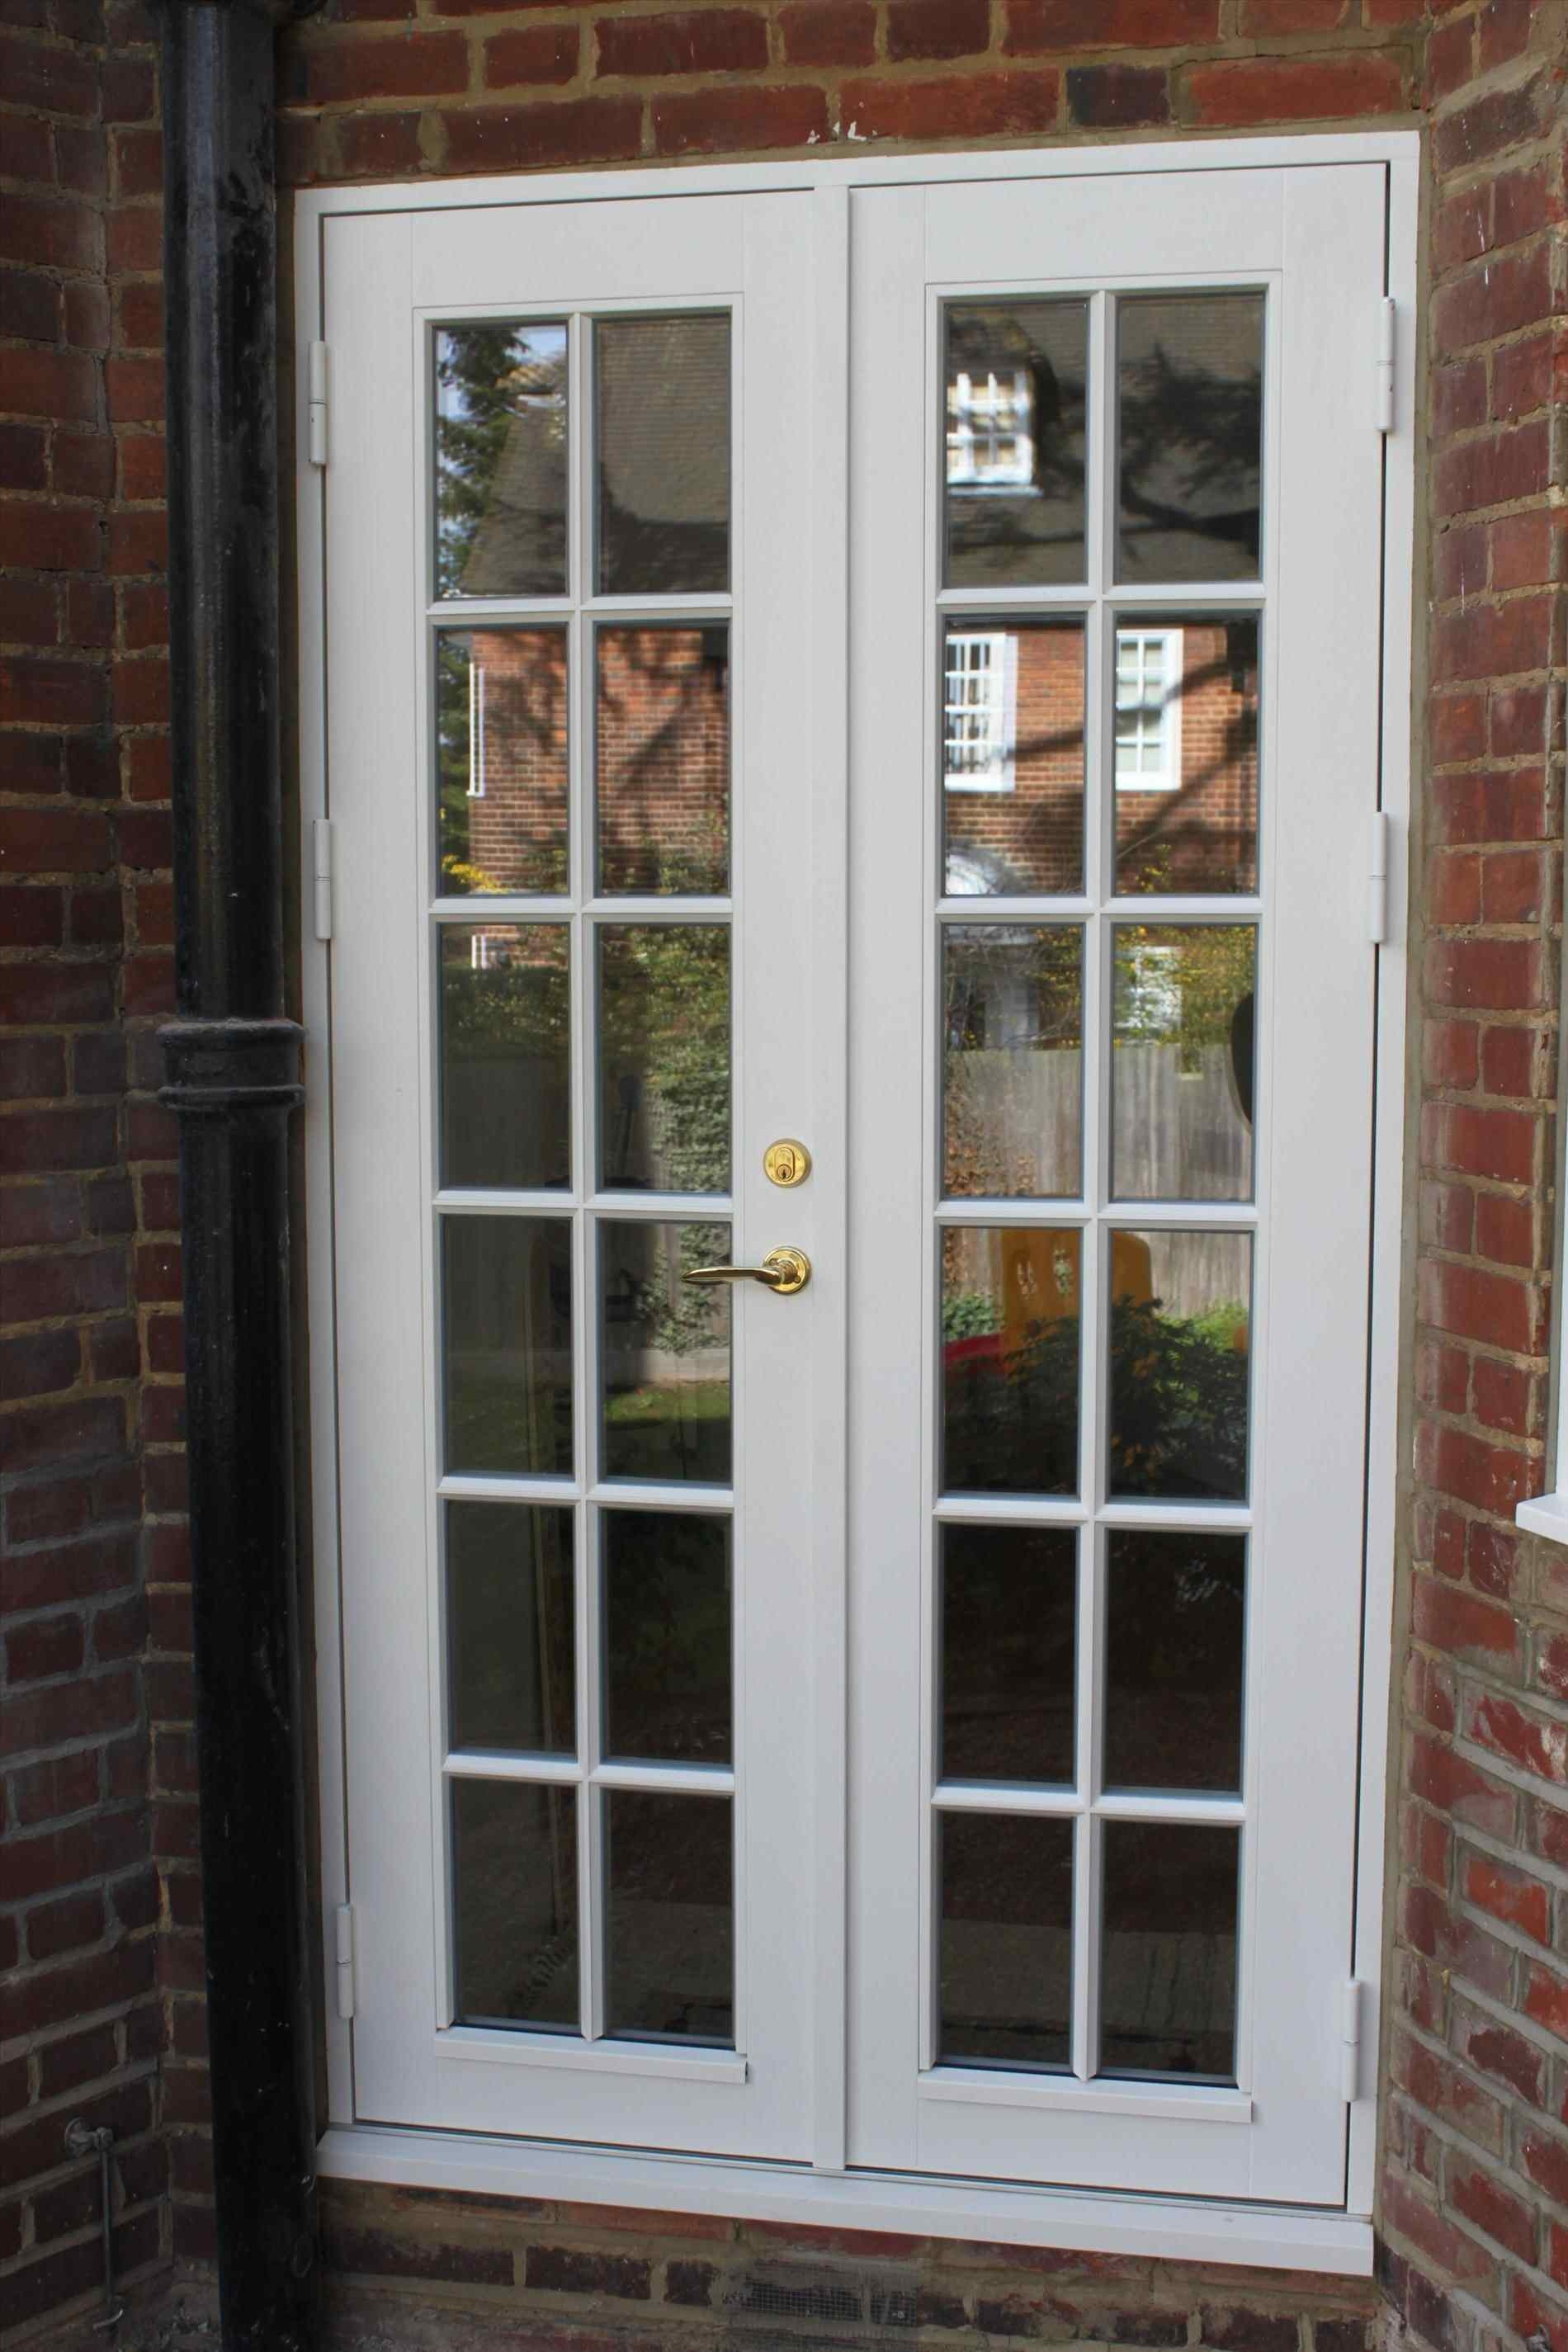 Pella 350 Series Sliding Door With Blinds Sliding Doors Pella 350 Series Sliding  Door With Blindspella